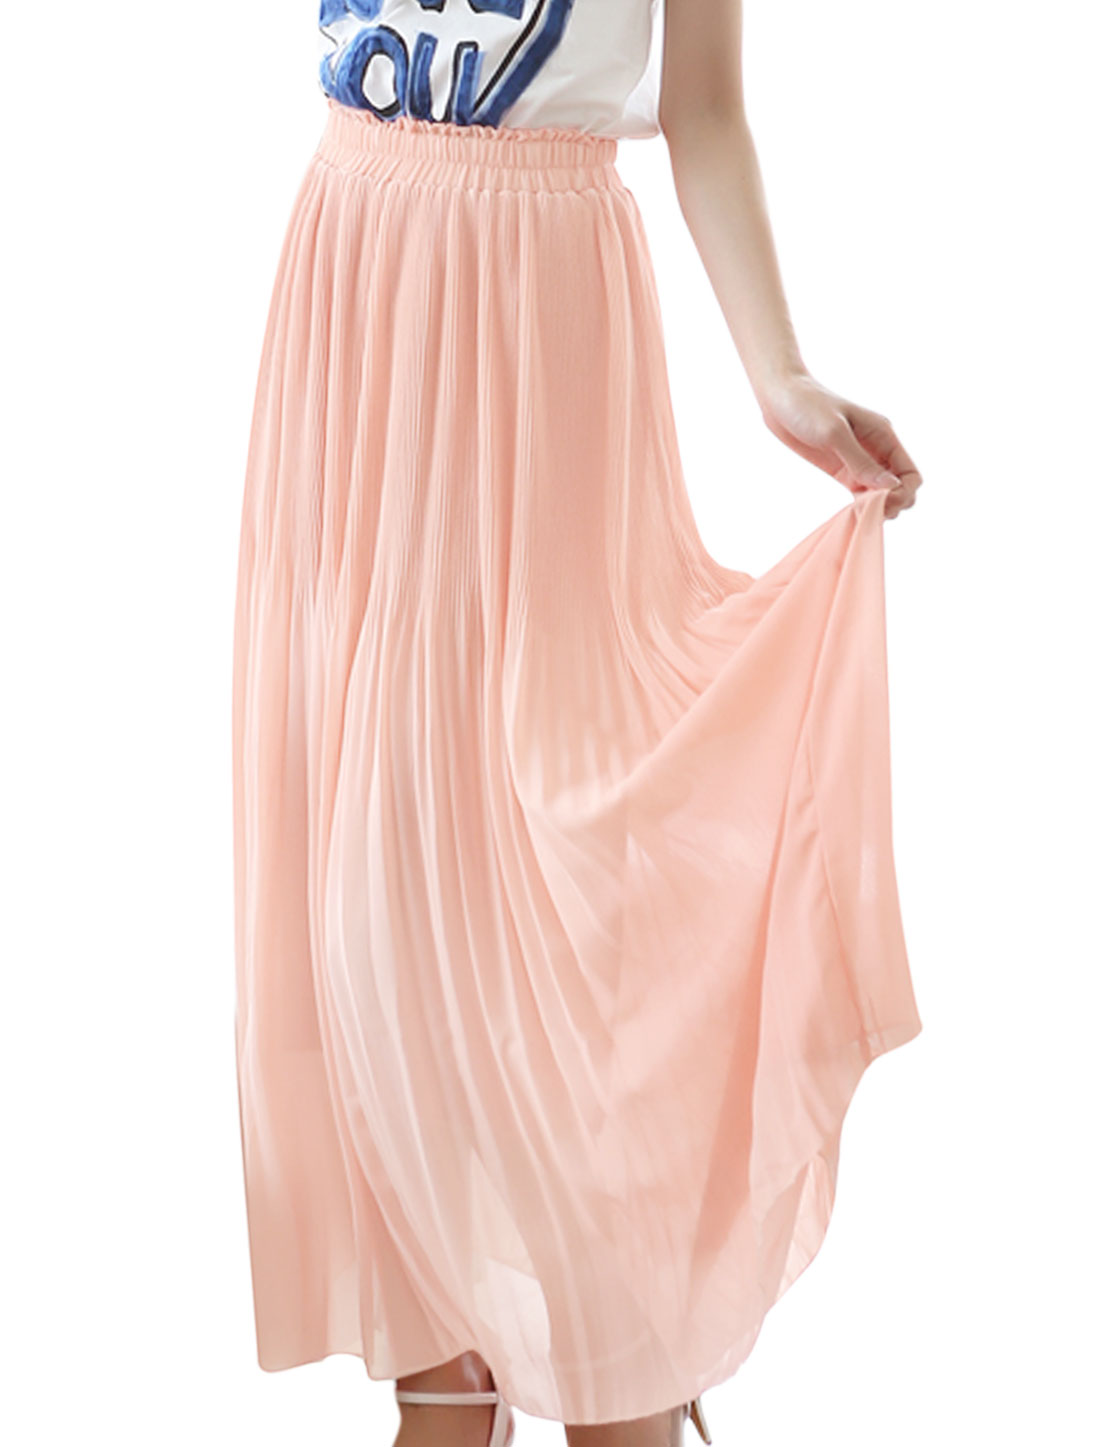 Lady Light Pink Elastic Waist Full-Length A-line Skirt XS